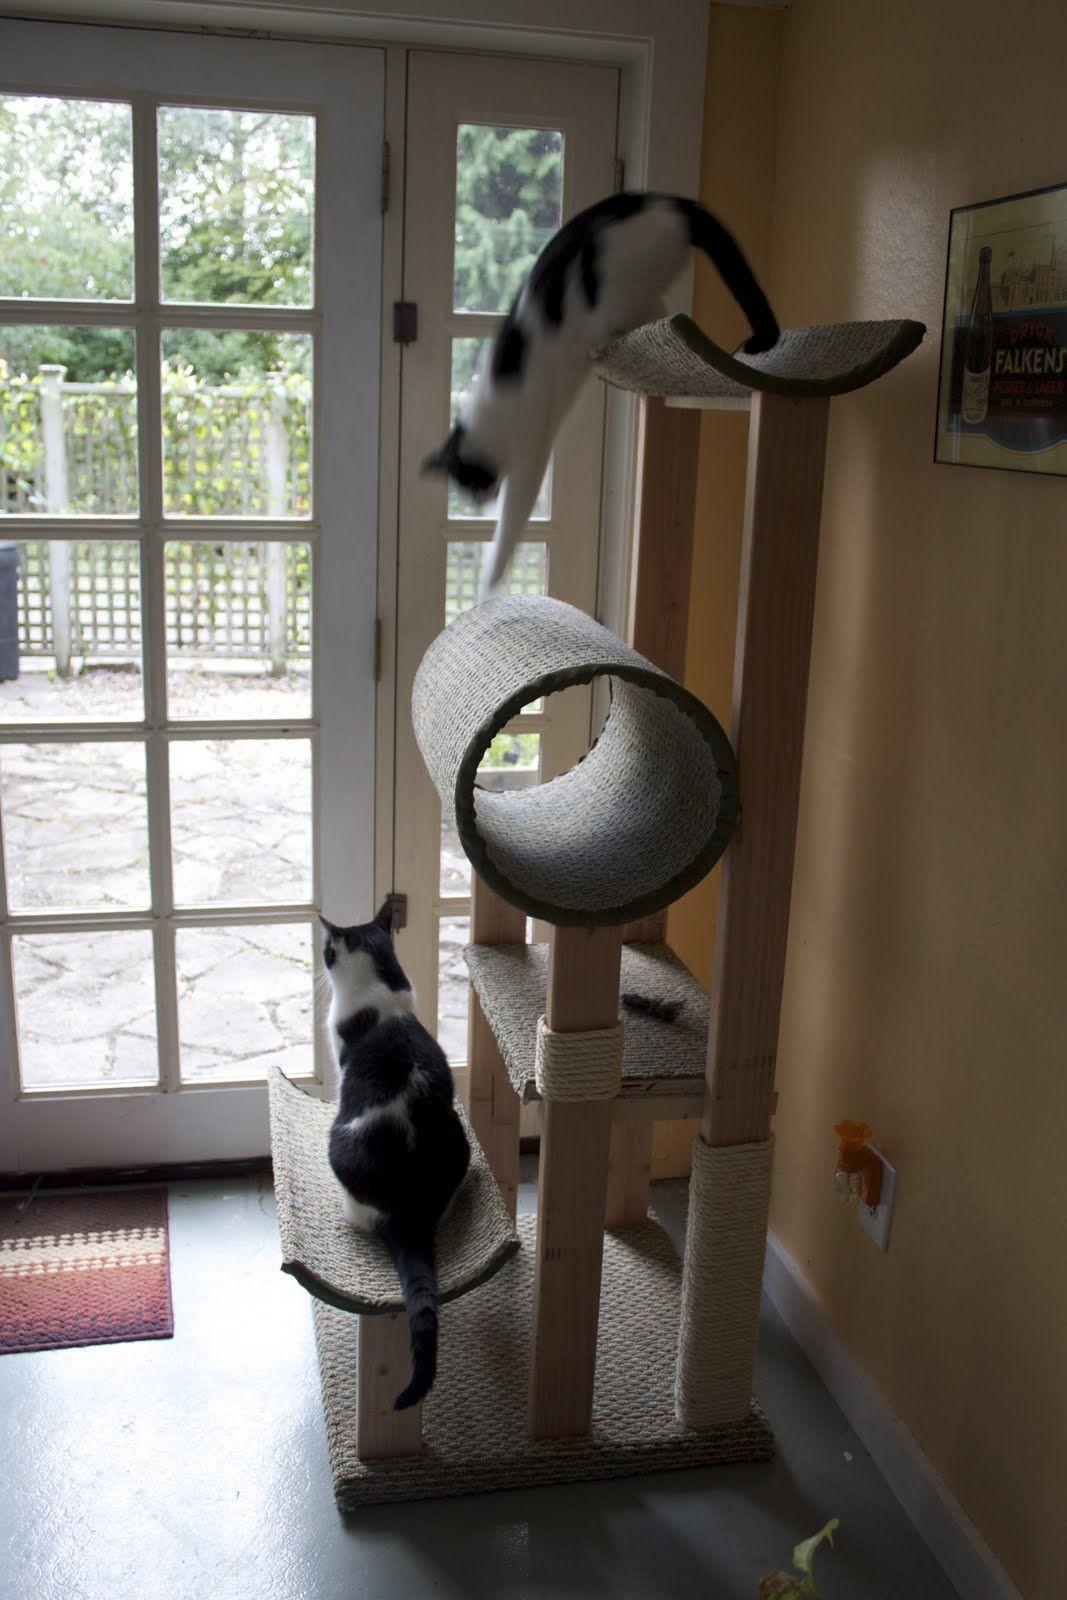 Best ideas about DIY Cat Scratching Post Plans . Save or Pin diy cat scratching post a very ambitious project but Now.